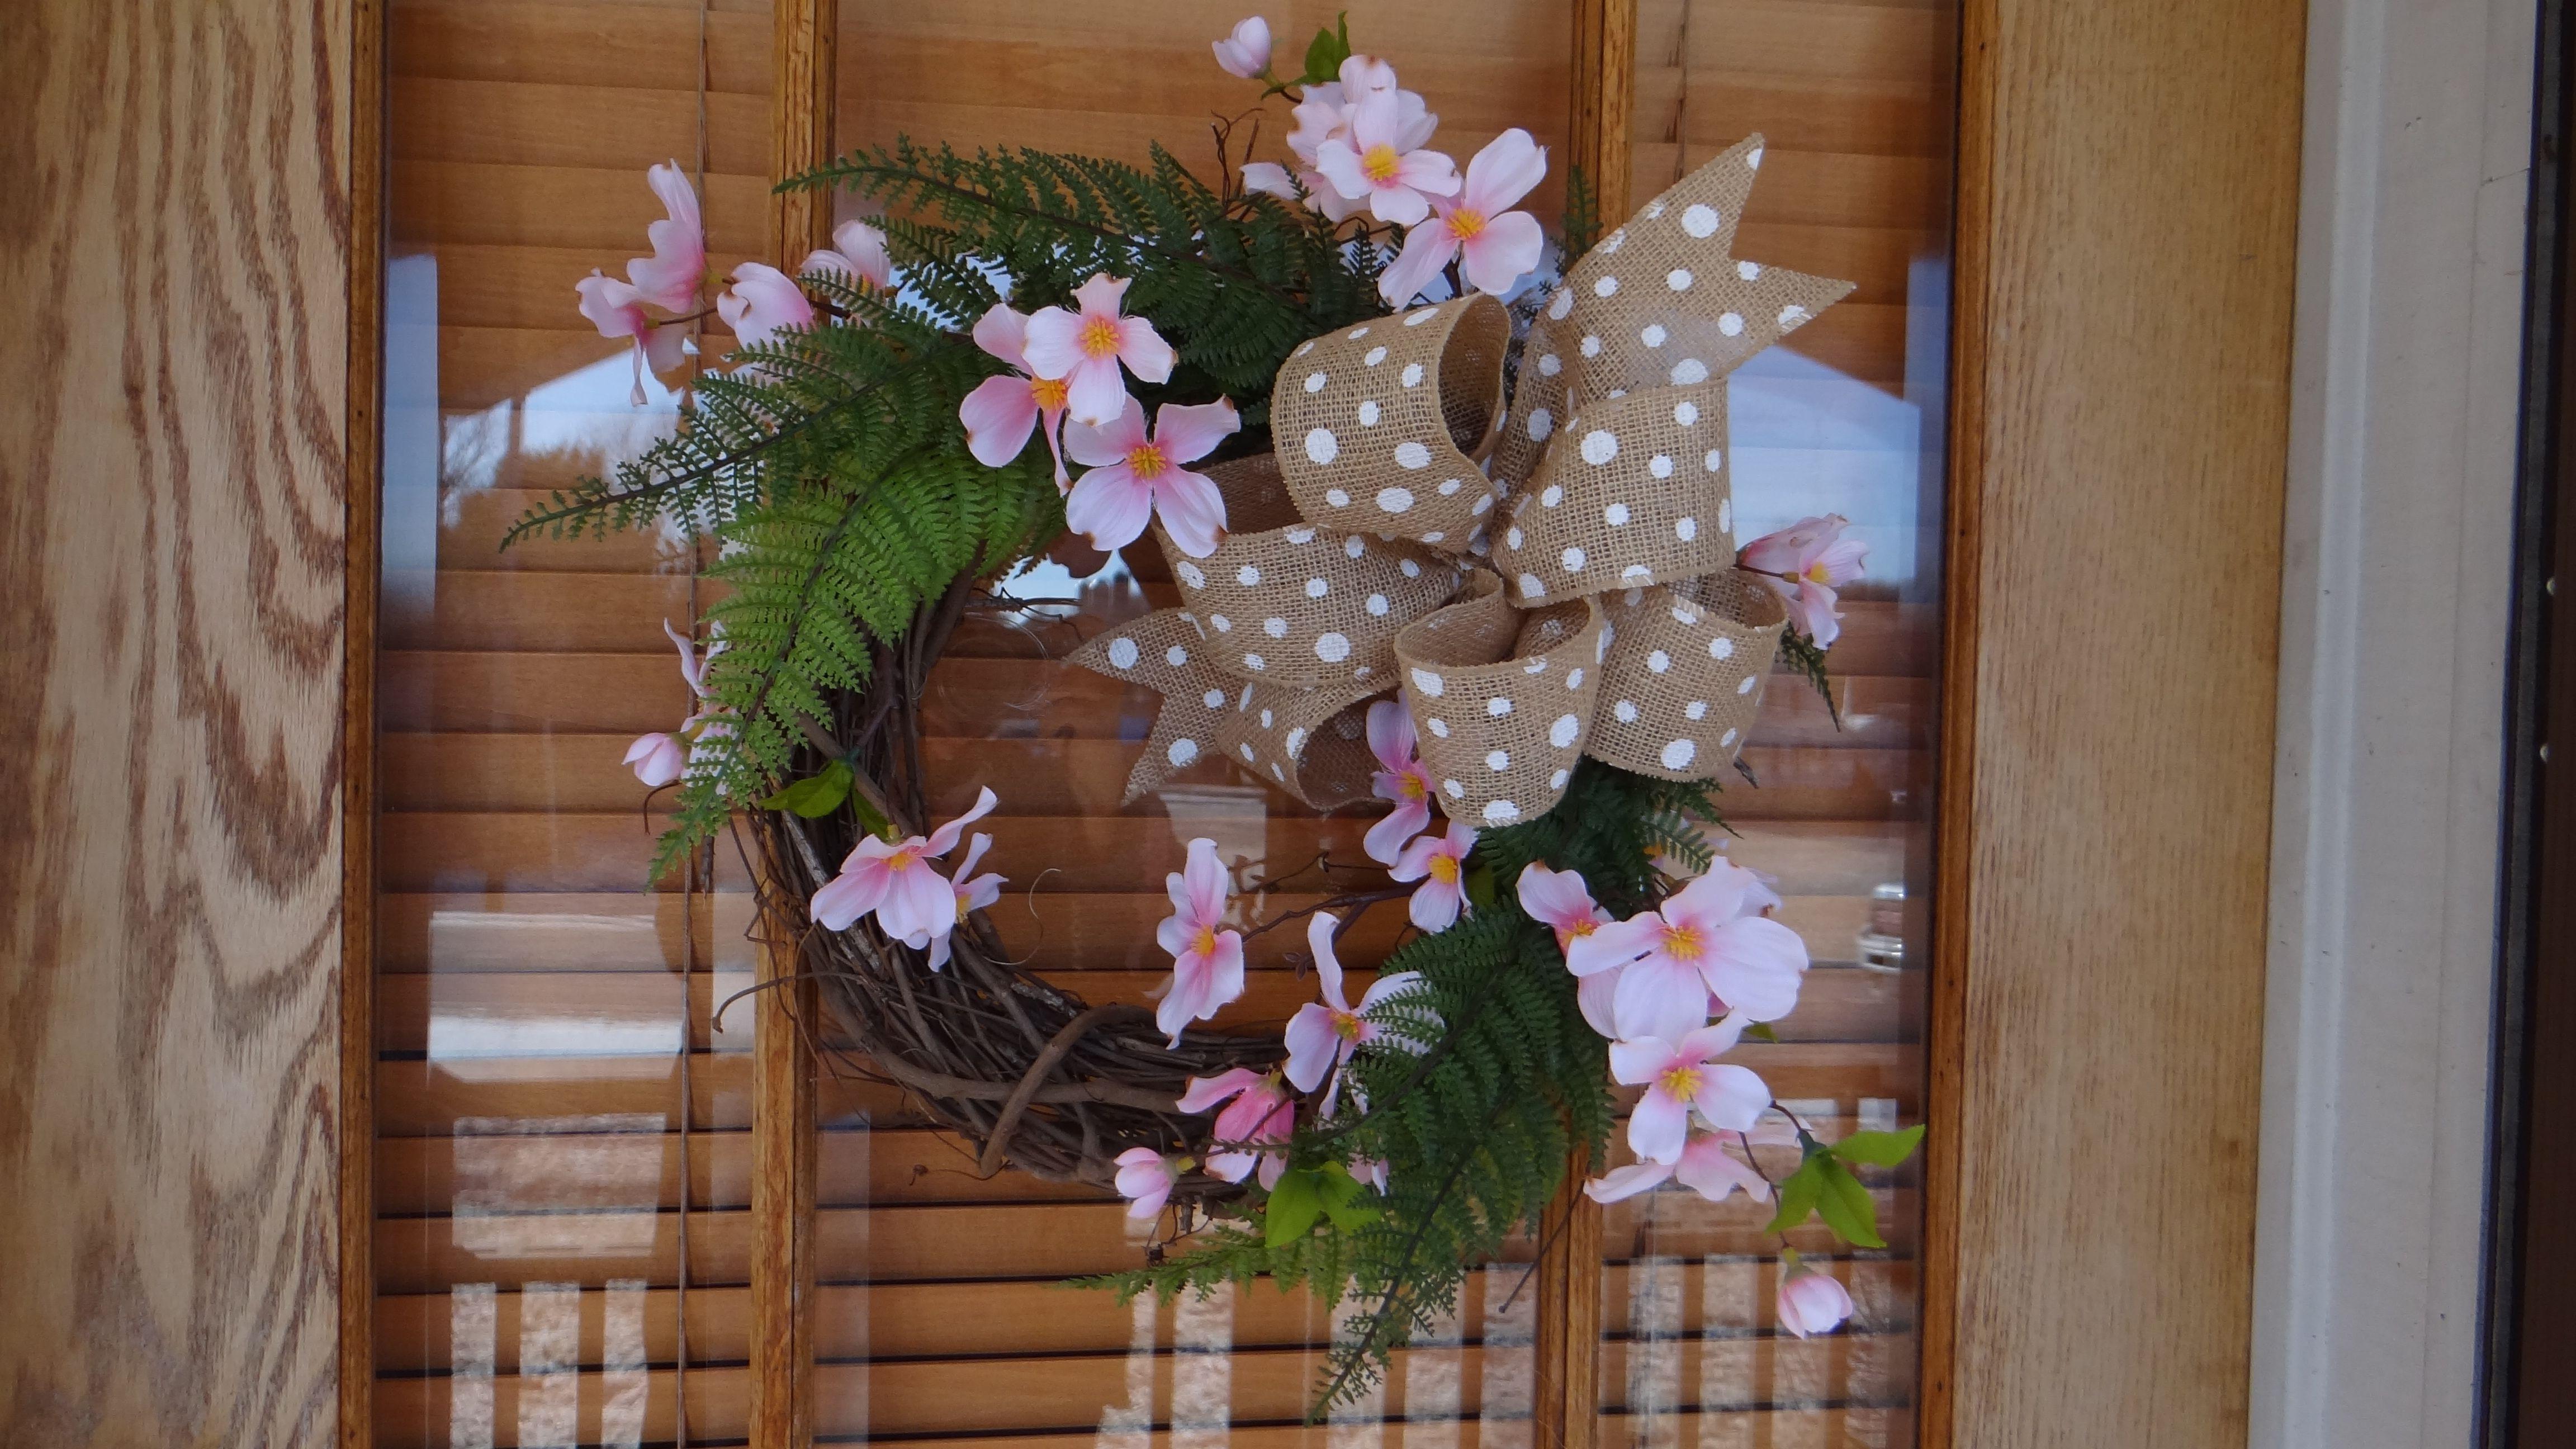 Fern And Dogwood On Grapevine Wreath Silk Flower Design Arrangement